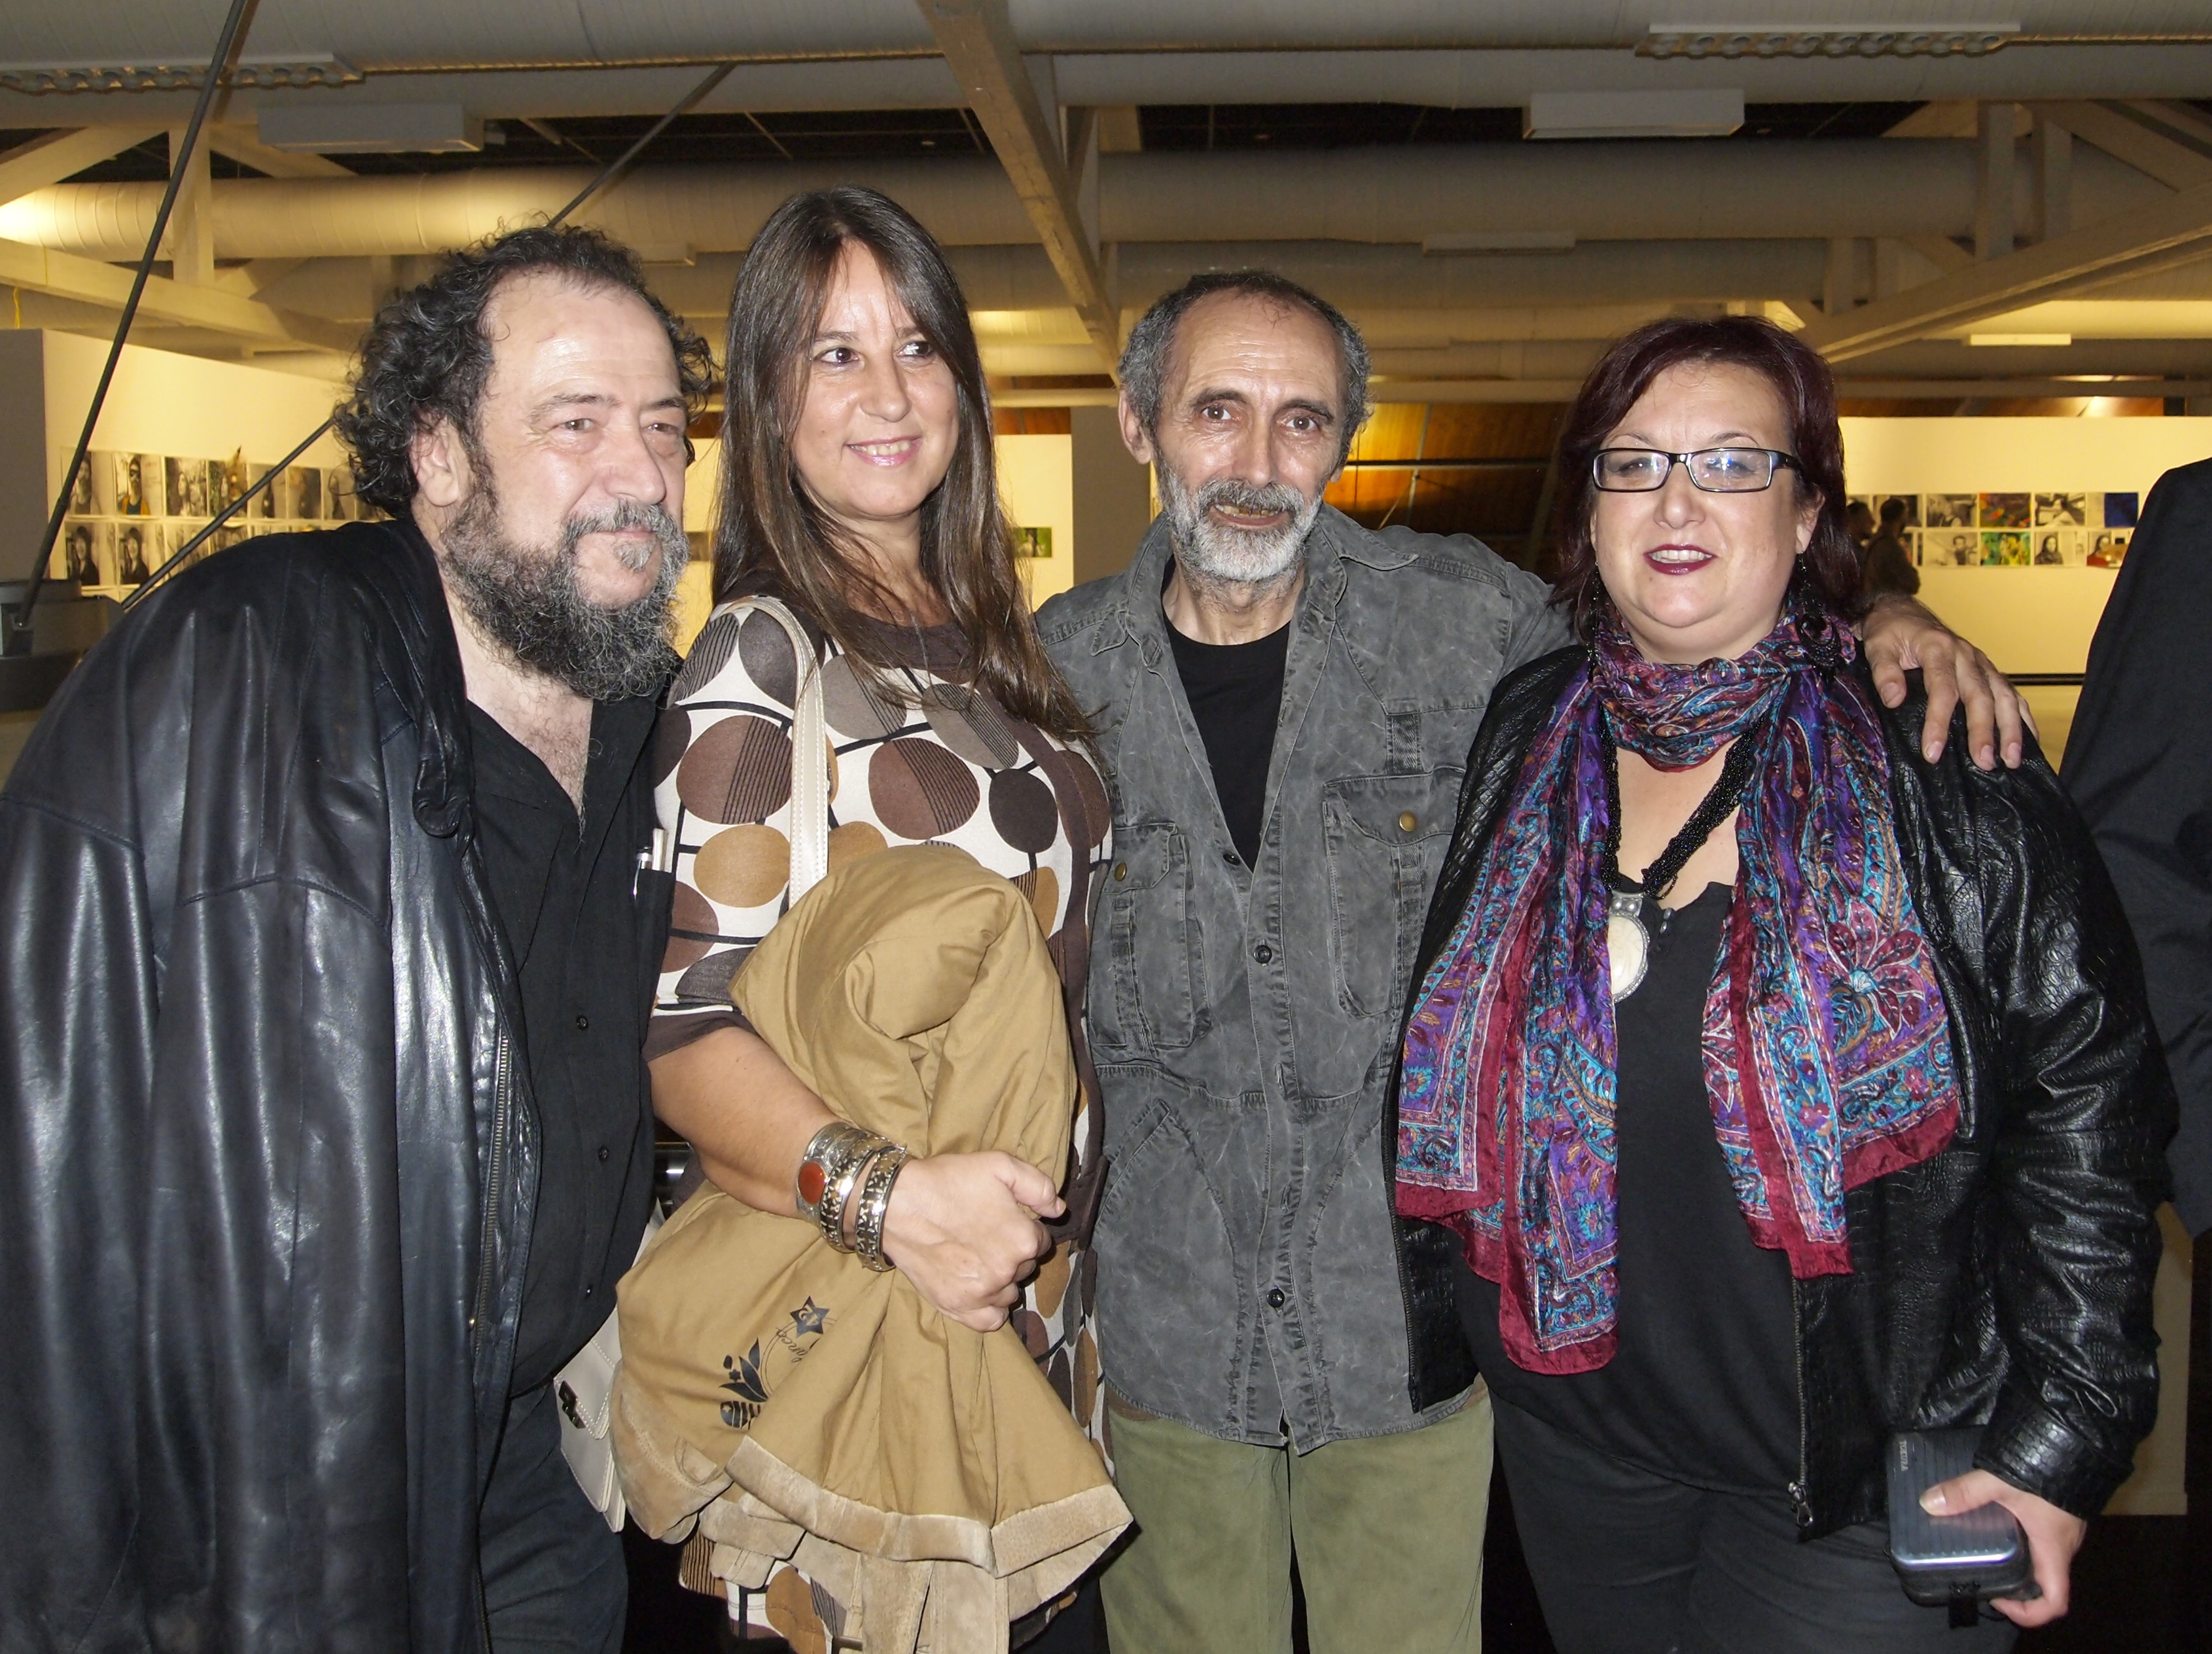 Con J.Méndez, Piensos, Nodar